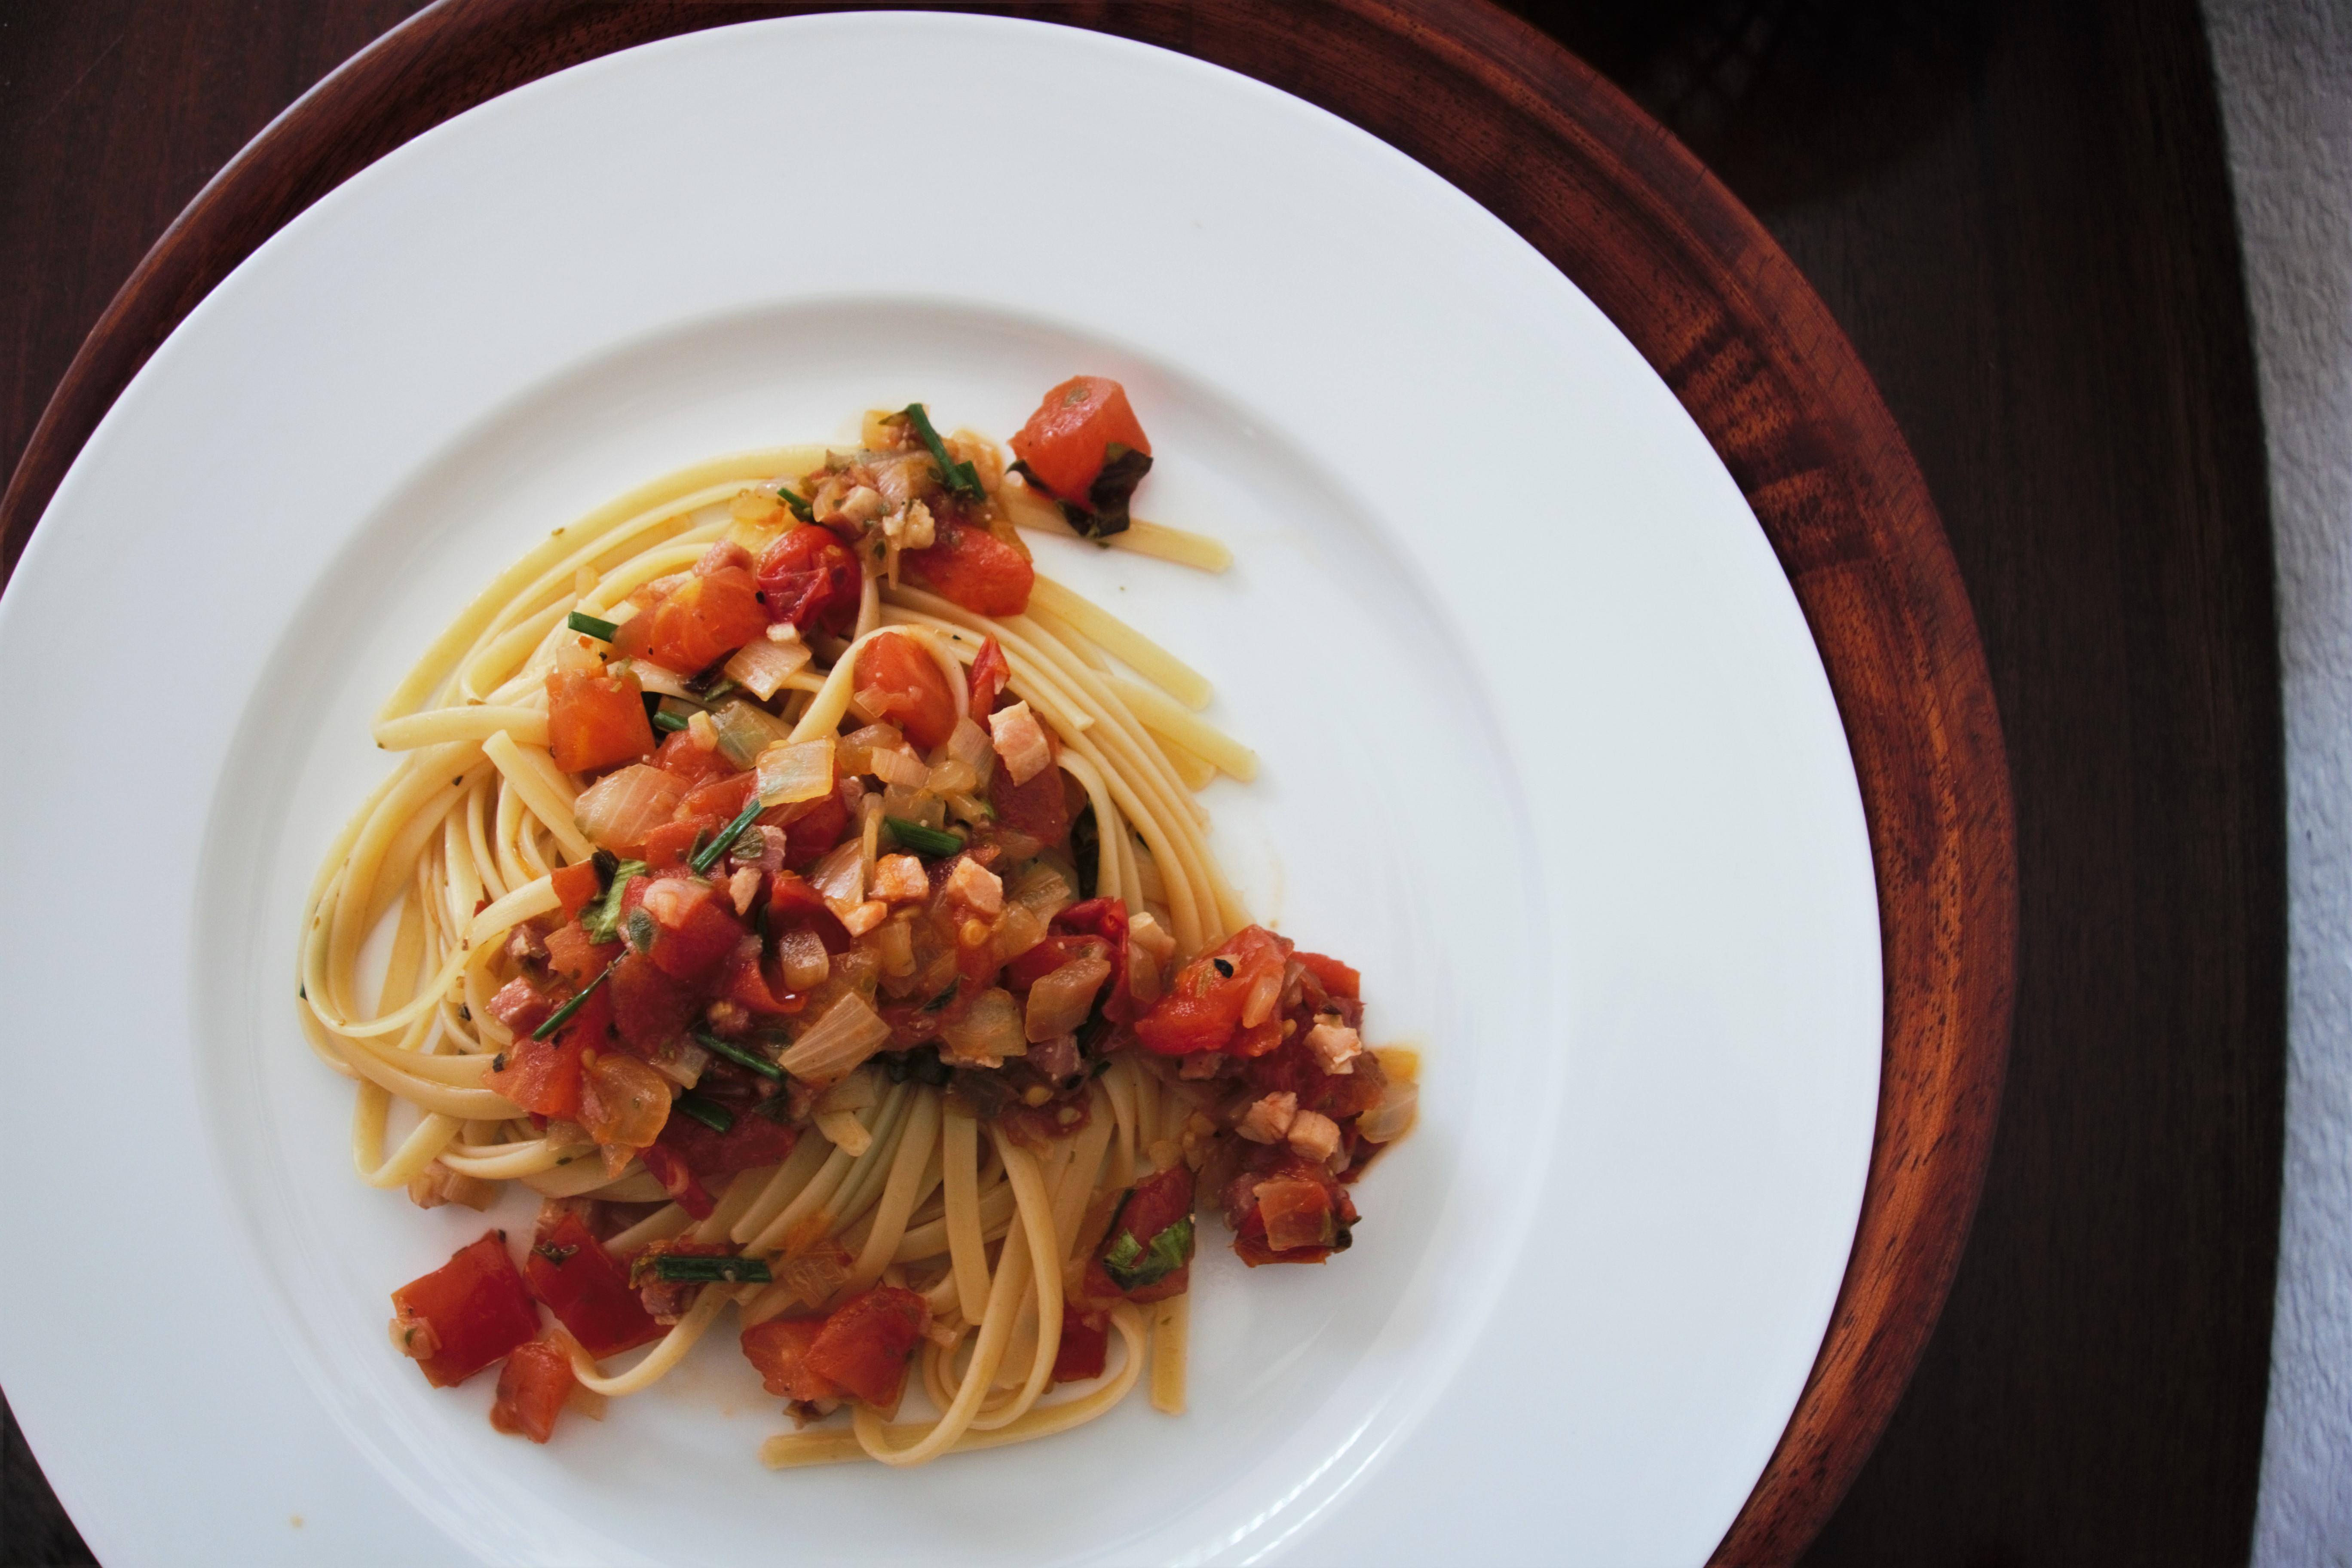 French Memories: My Go-to Pasta Recipe